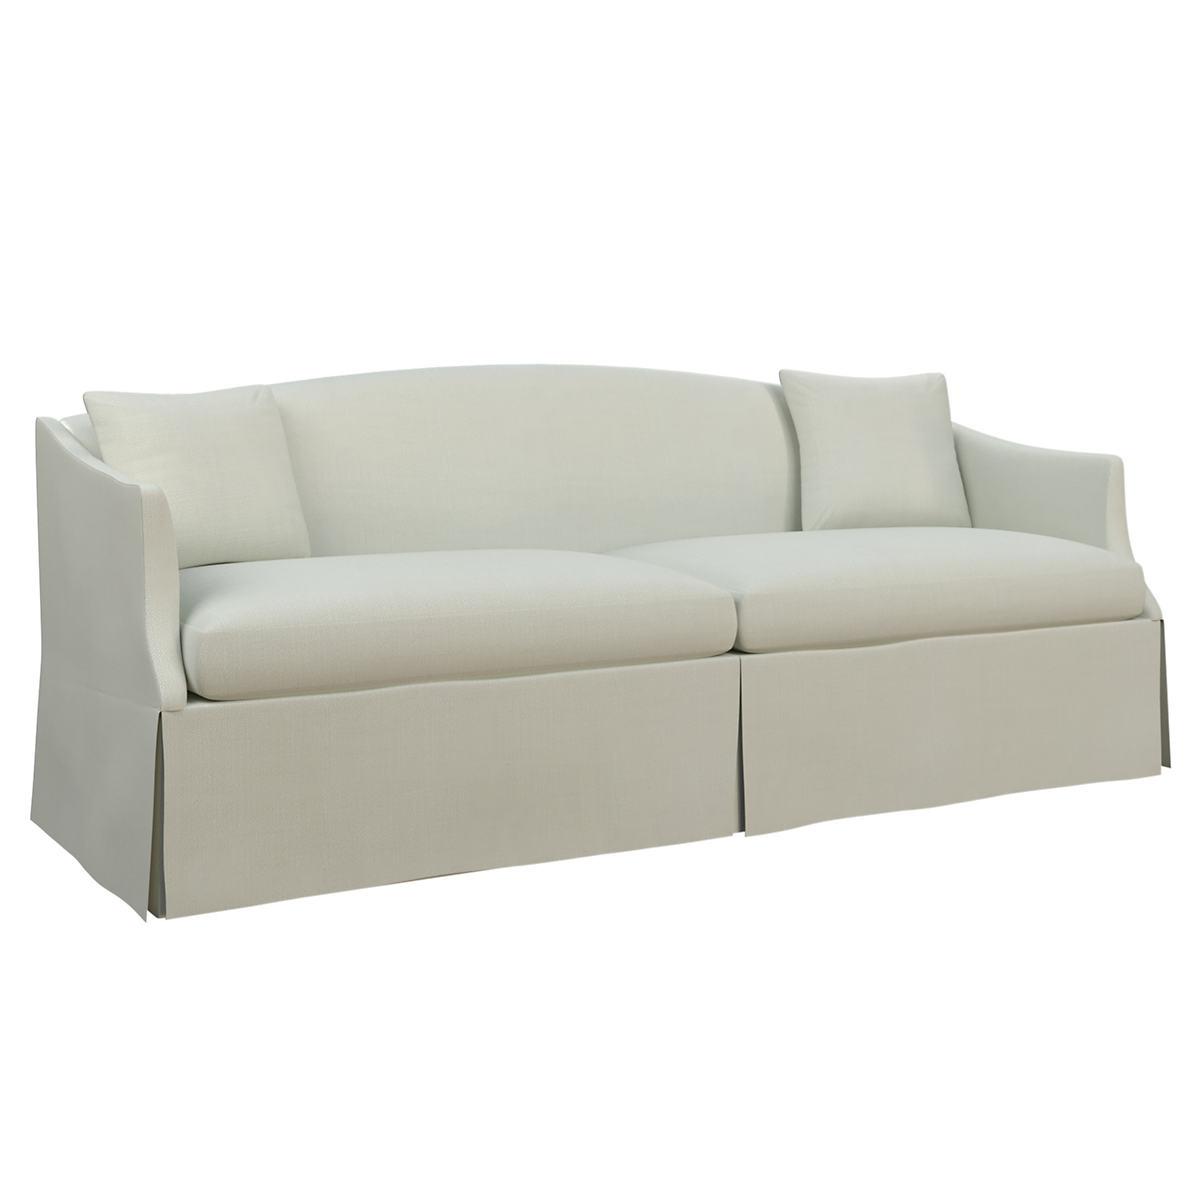 Nubby Mist Avignon Sofa